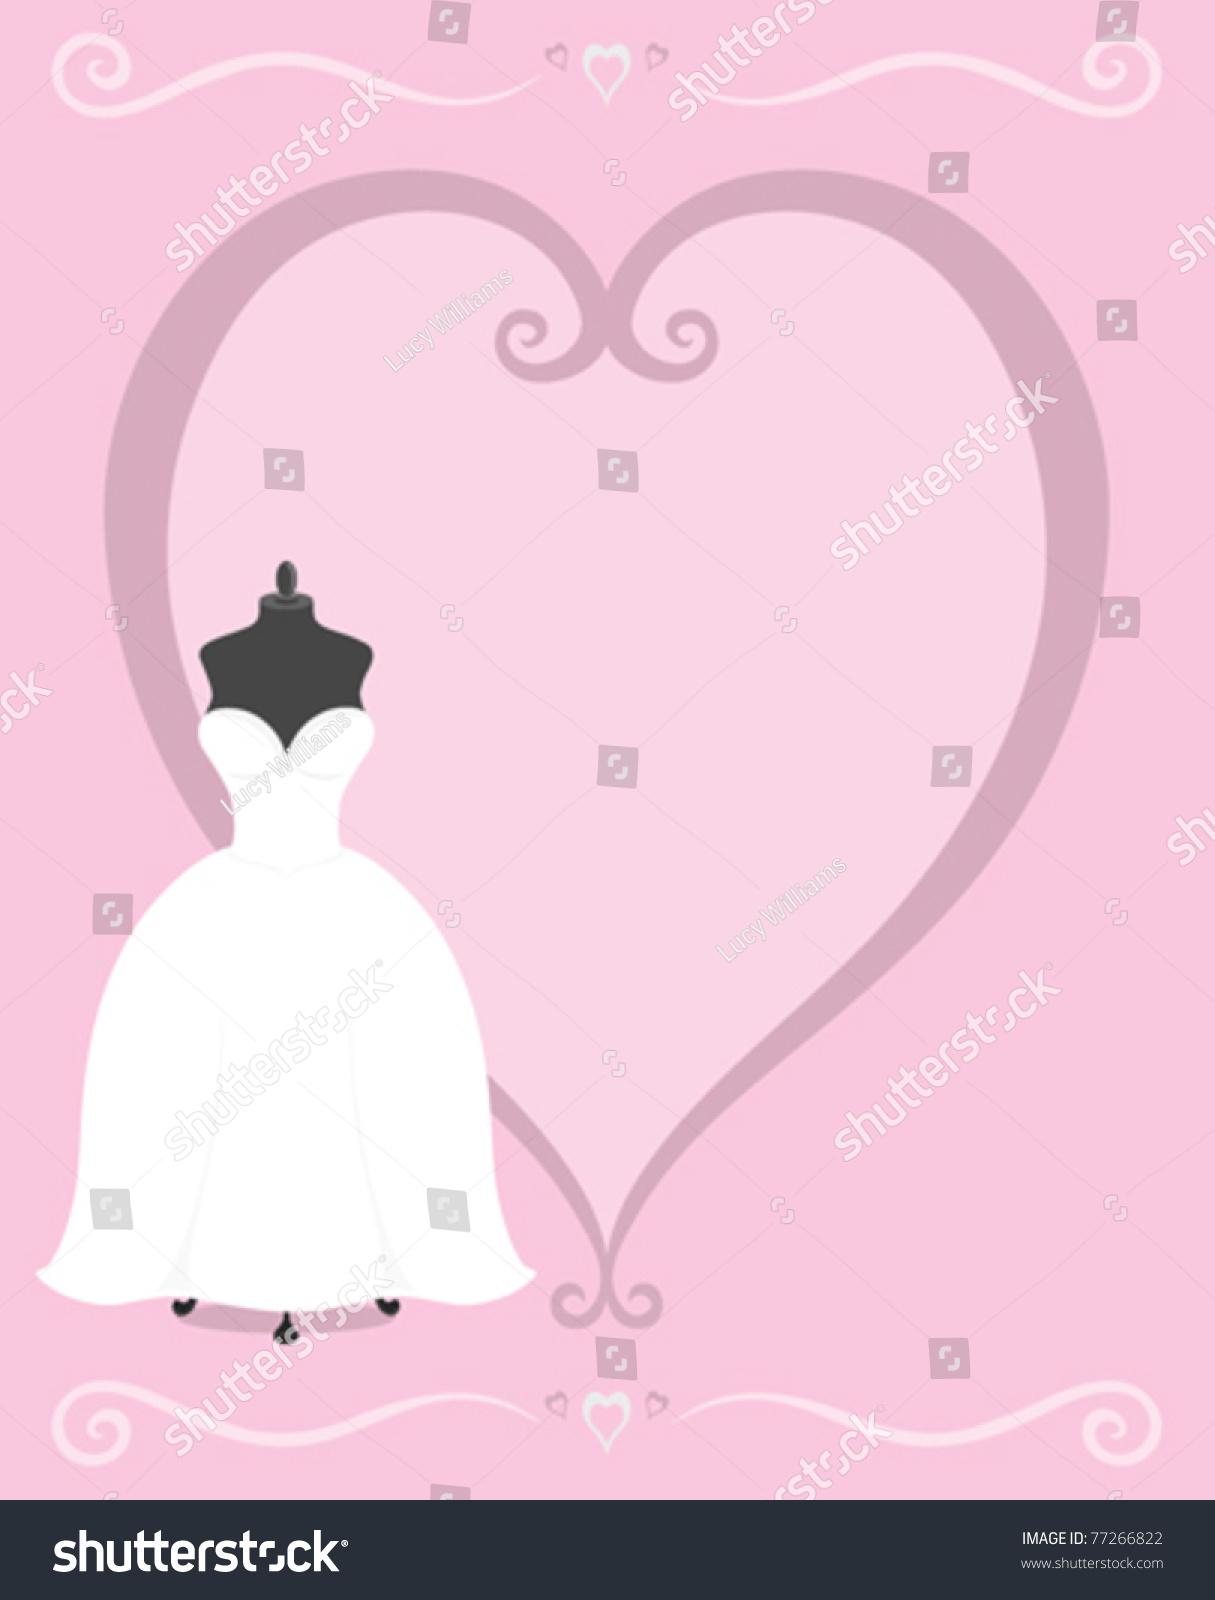 d heart shaped wedding dress Honeymoon bridal wedding dresses Korean lace heart shaped smears chest wedding band Princess wedding